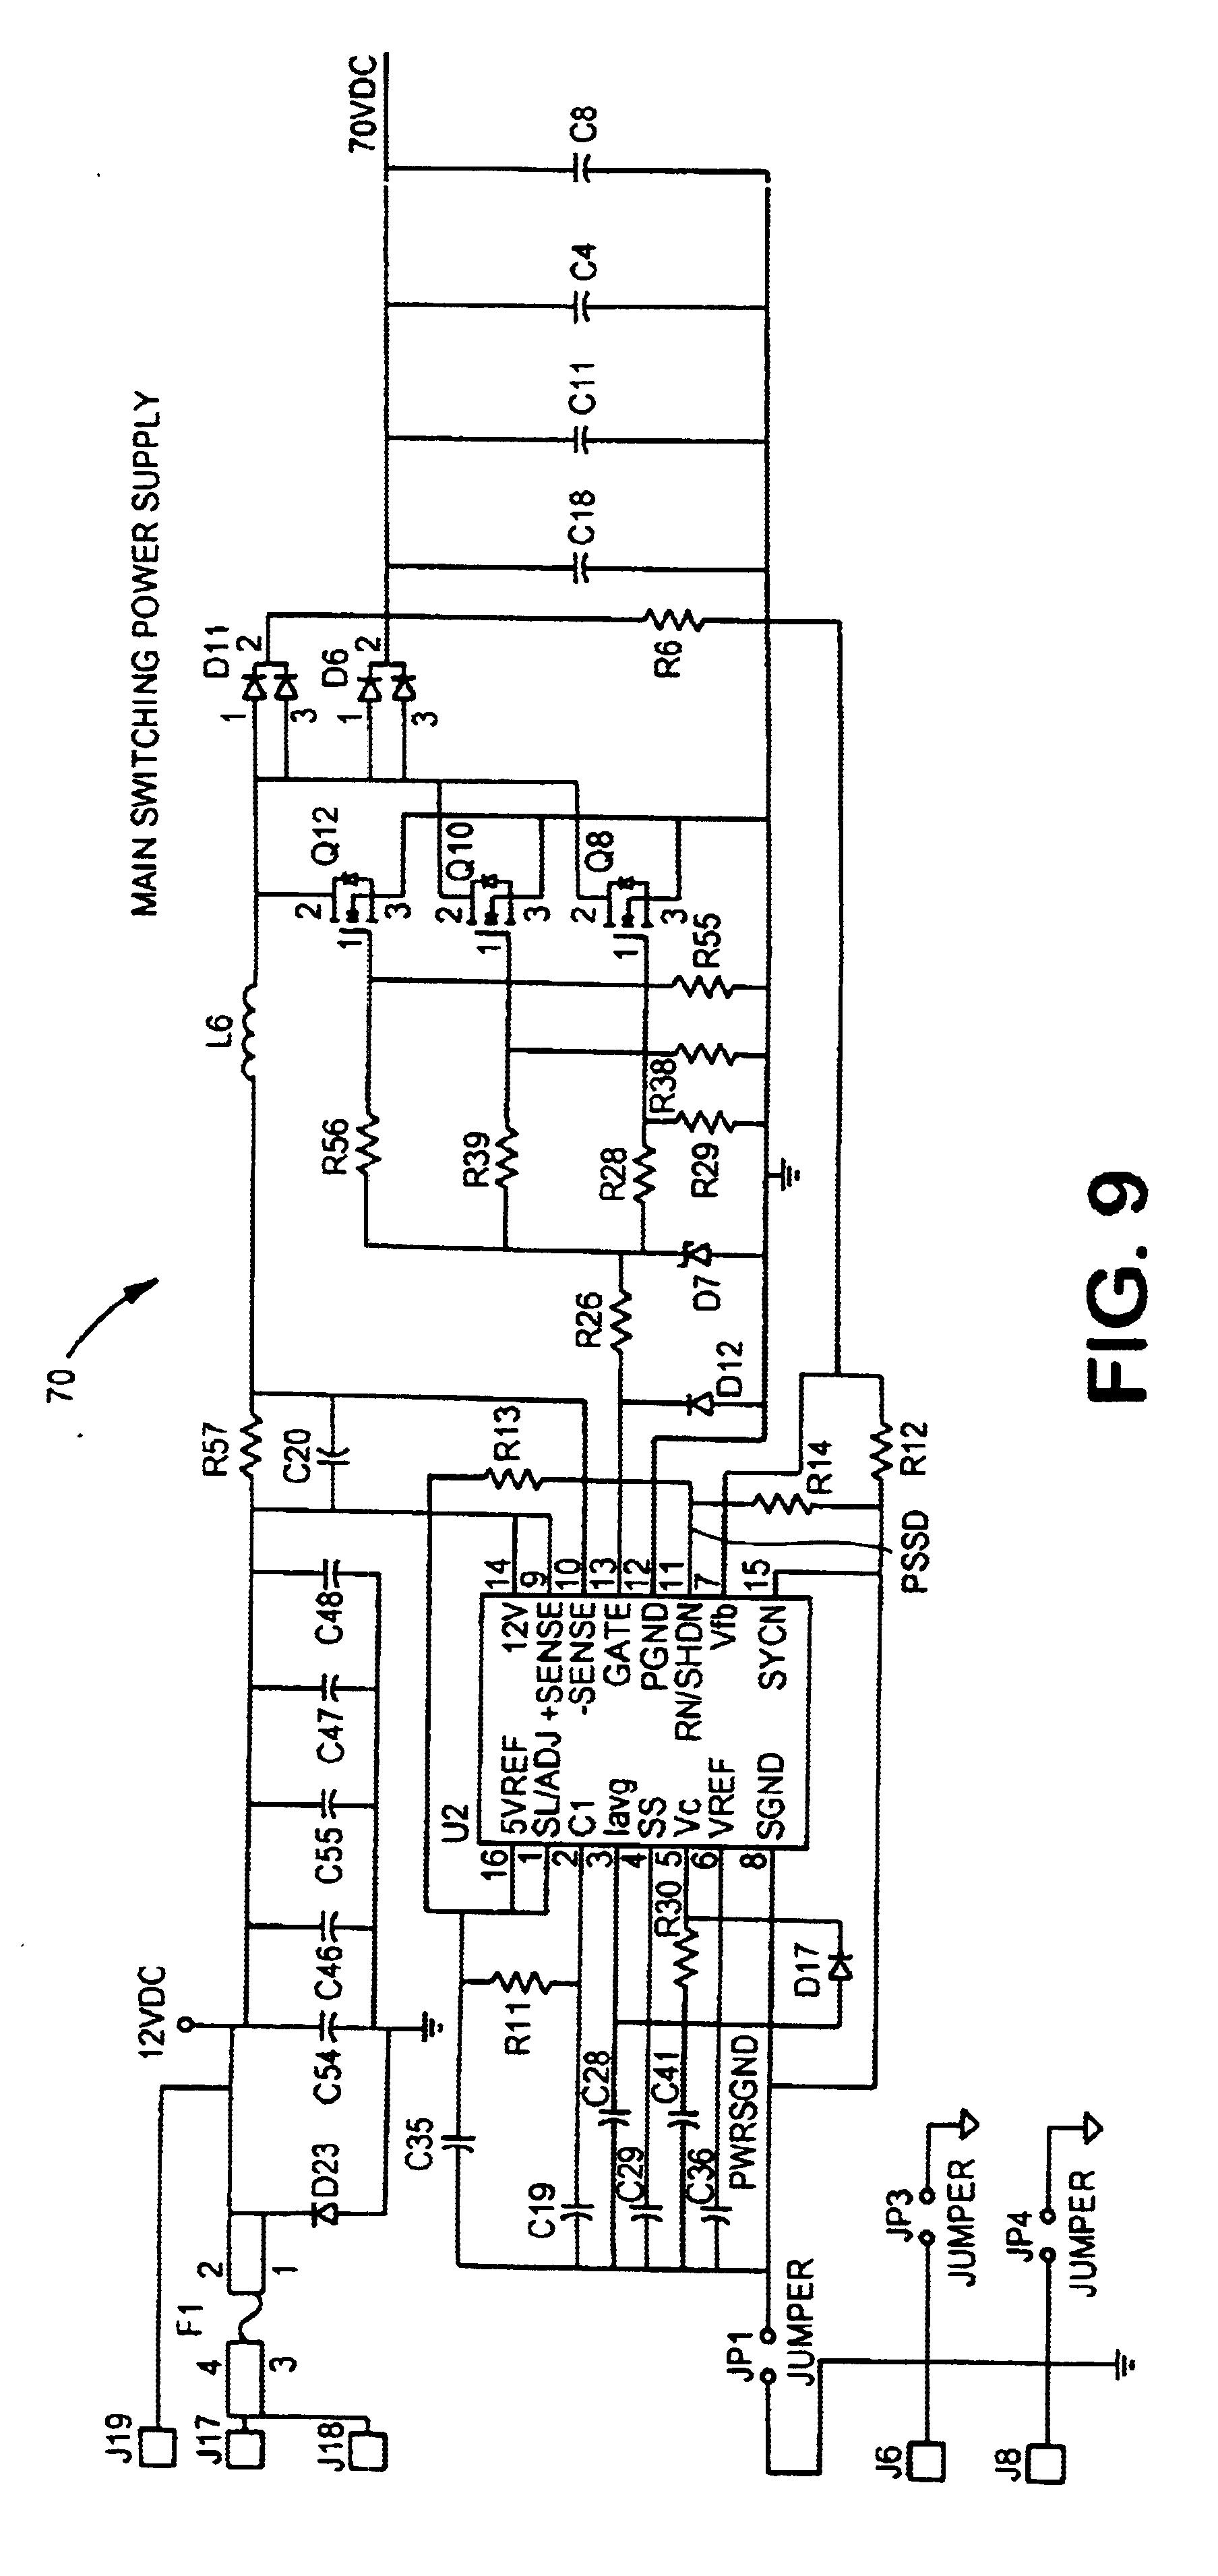 patent us6646548 - electronic siren